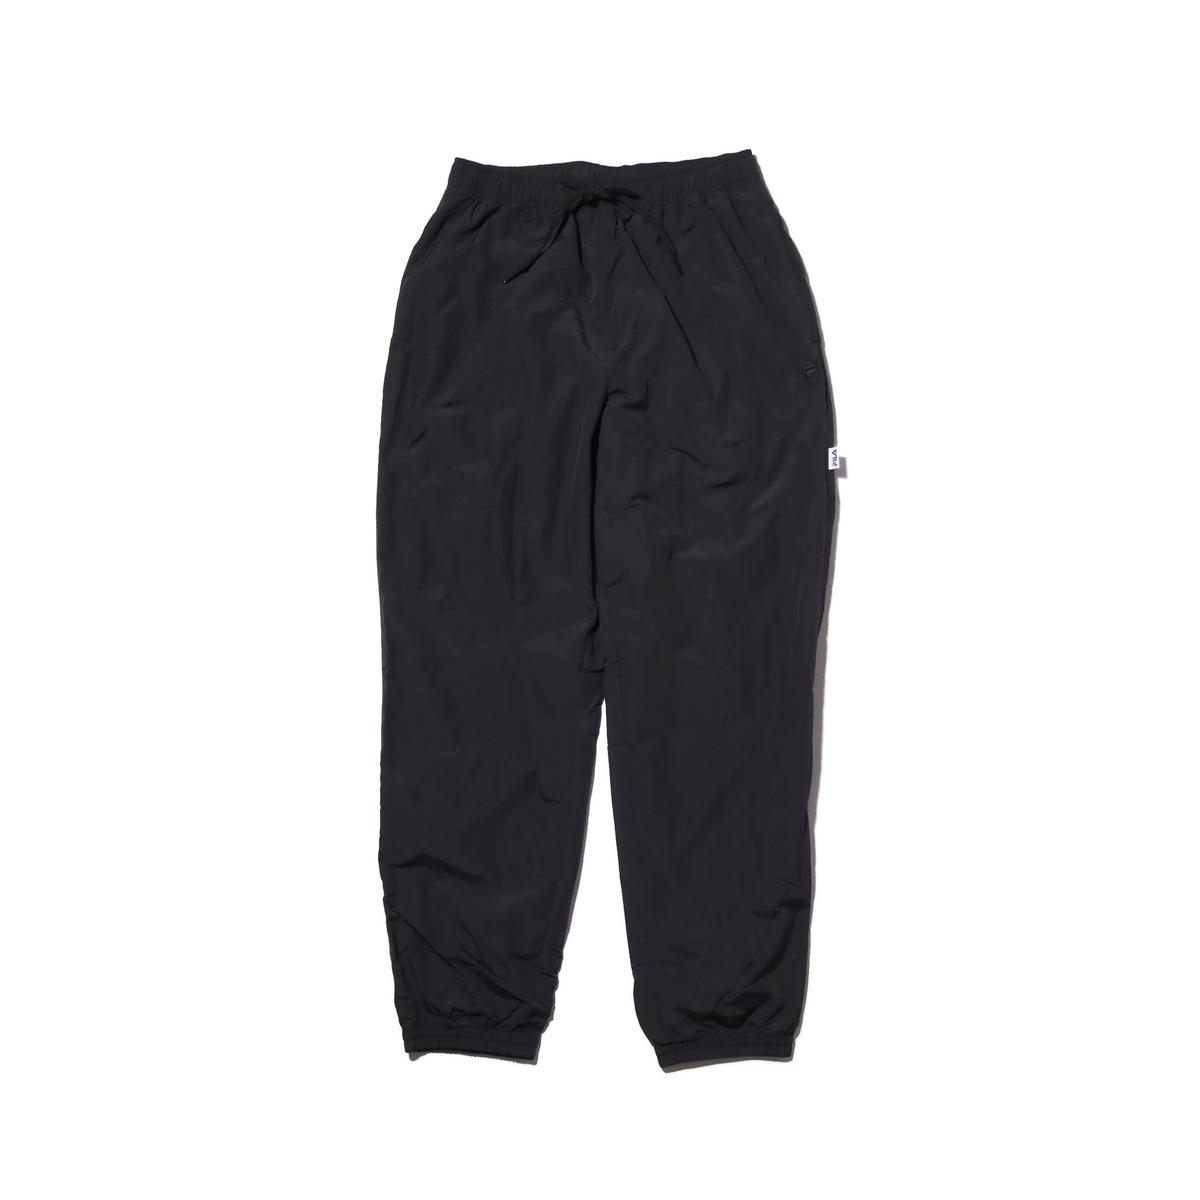 FILA Easy long pants (フィラ イージー ロング パンツ)BLACK【メンズ パンツ】18FW-I